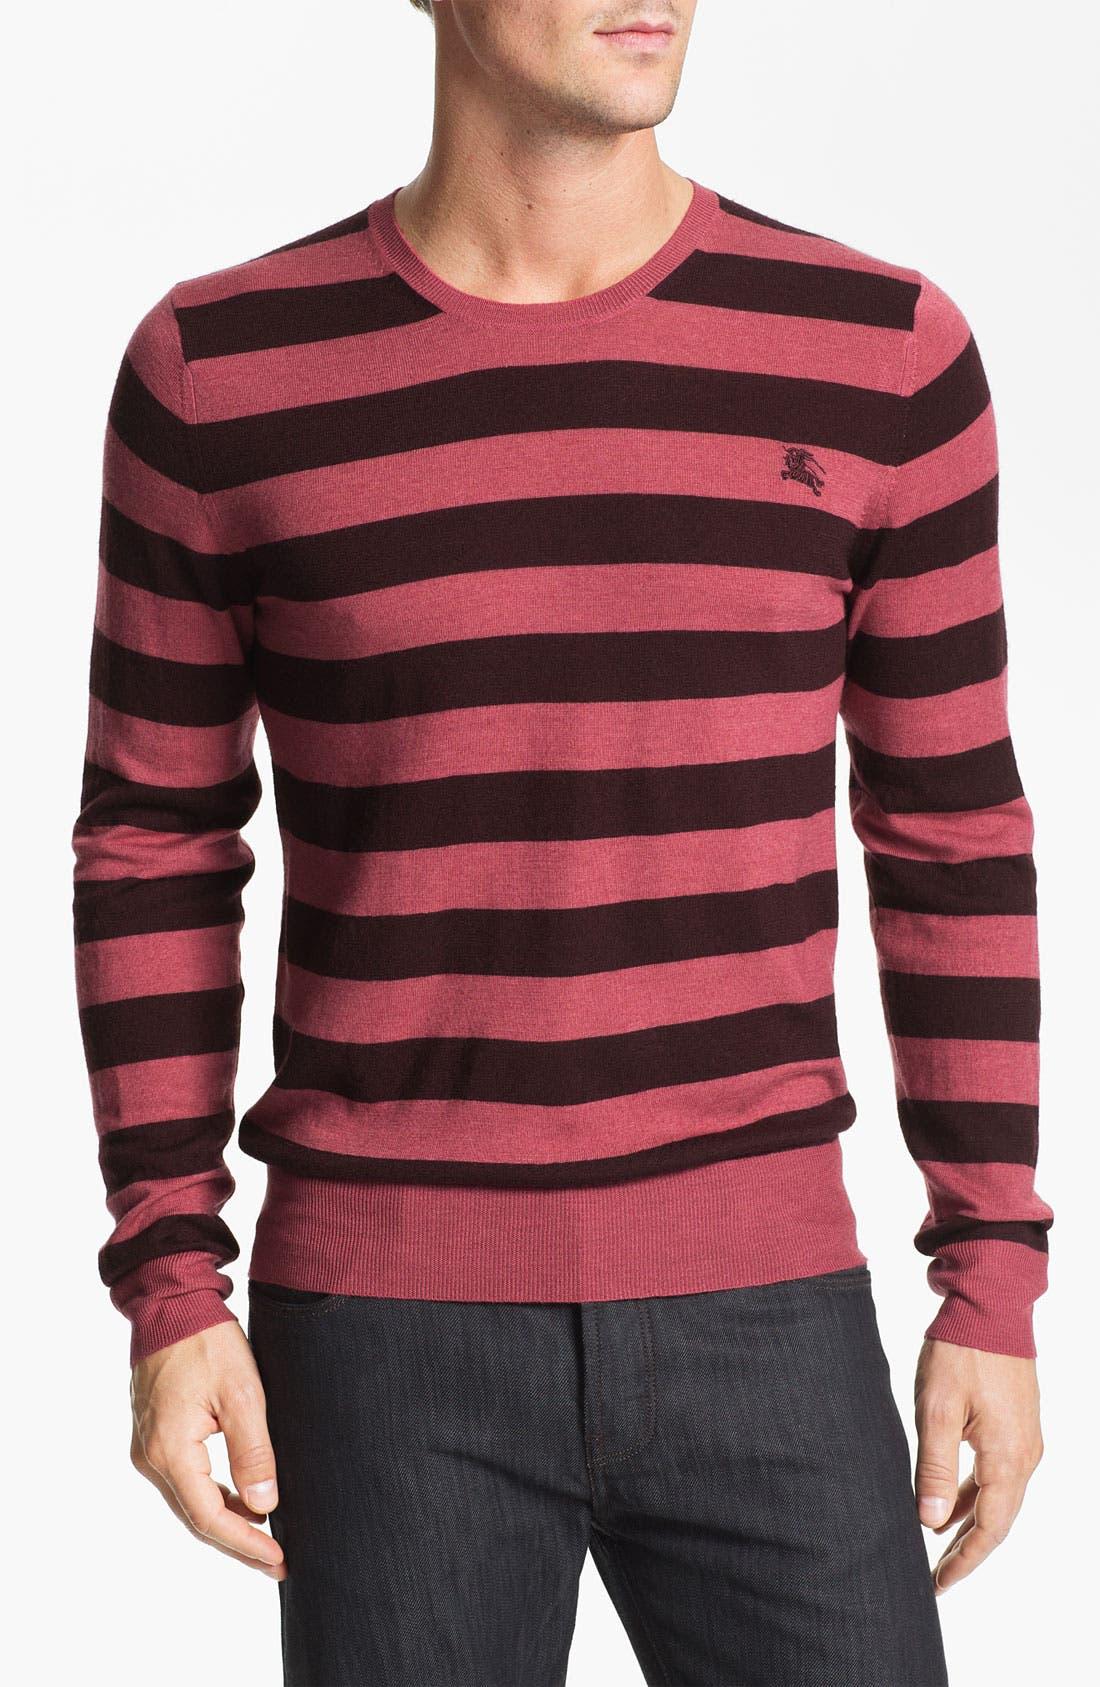 Main Image - Burberry Brit 'Peyton' Lightweight Merino Wool Sweater